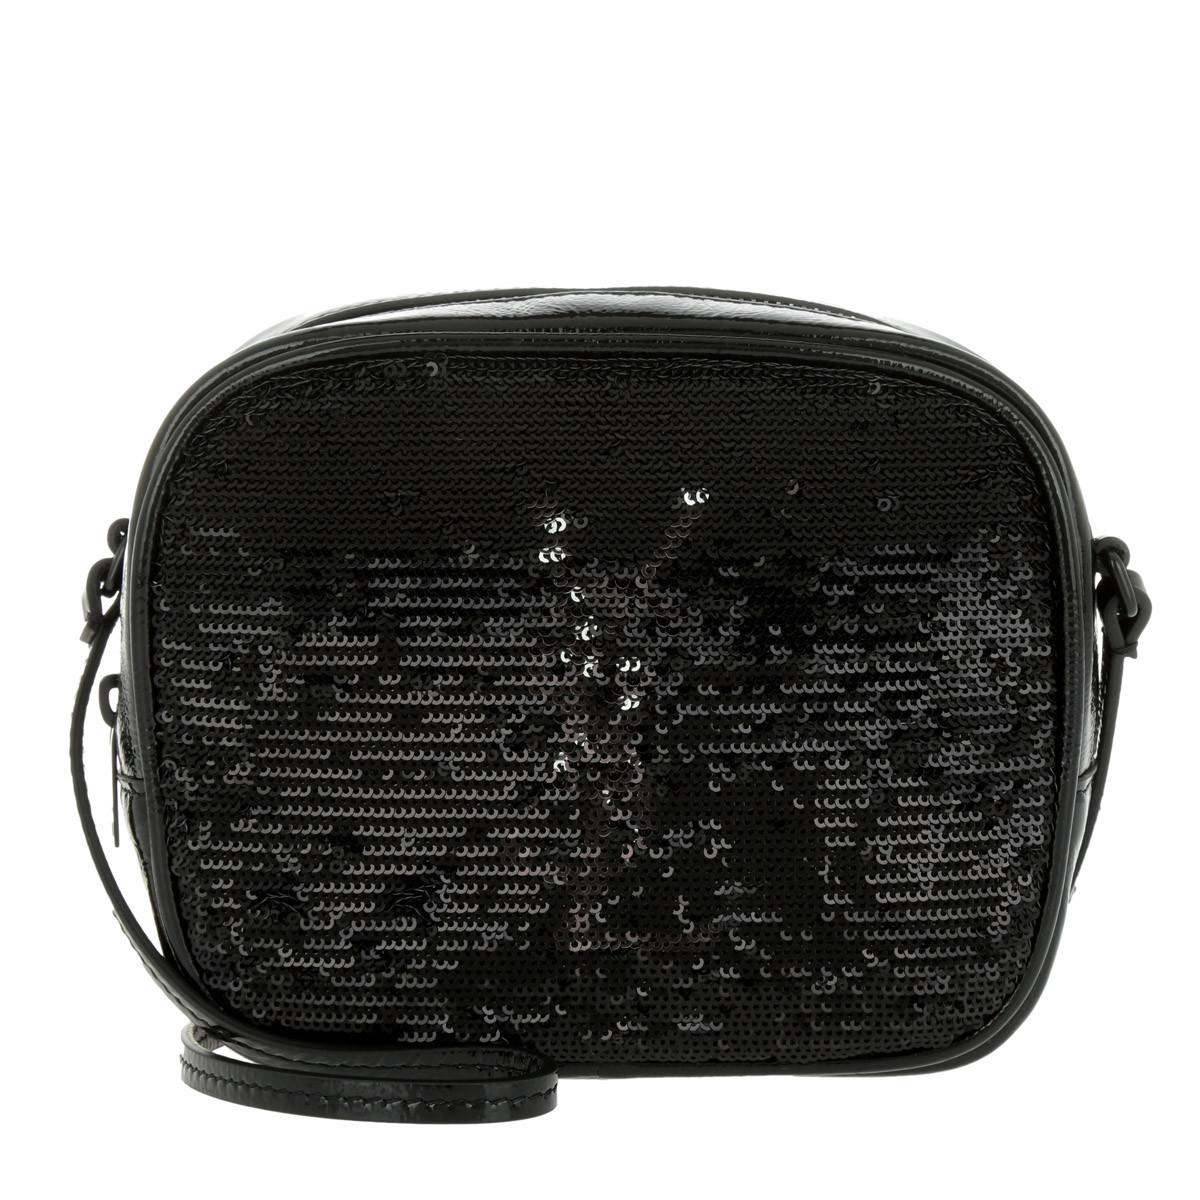 3812c84912 Saint Laurent Ysl Monogramme Sl Blogger Bag Noir in Black - Save 28 ...